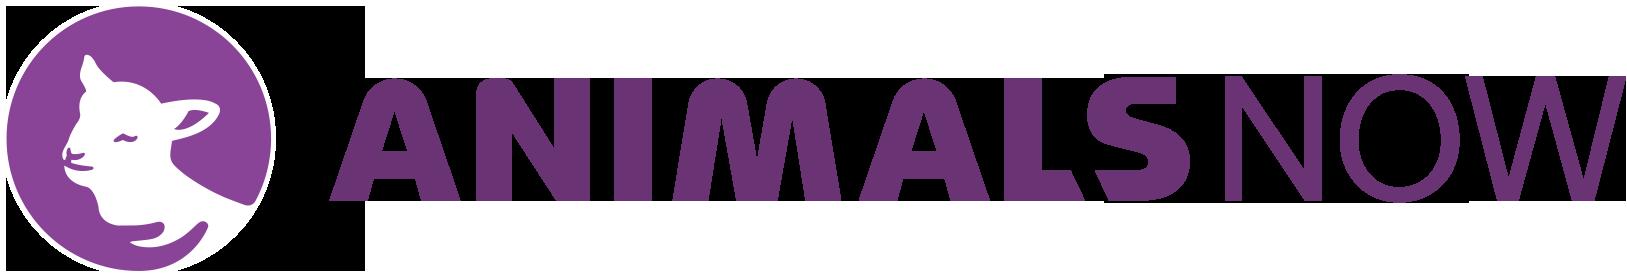 animals-now-logo-full